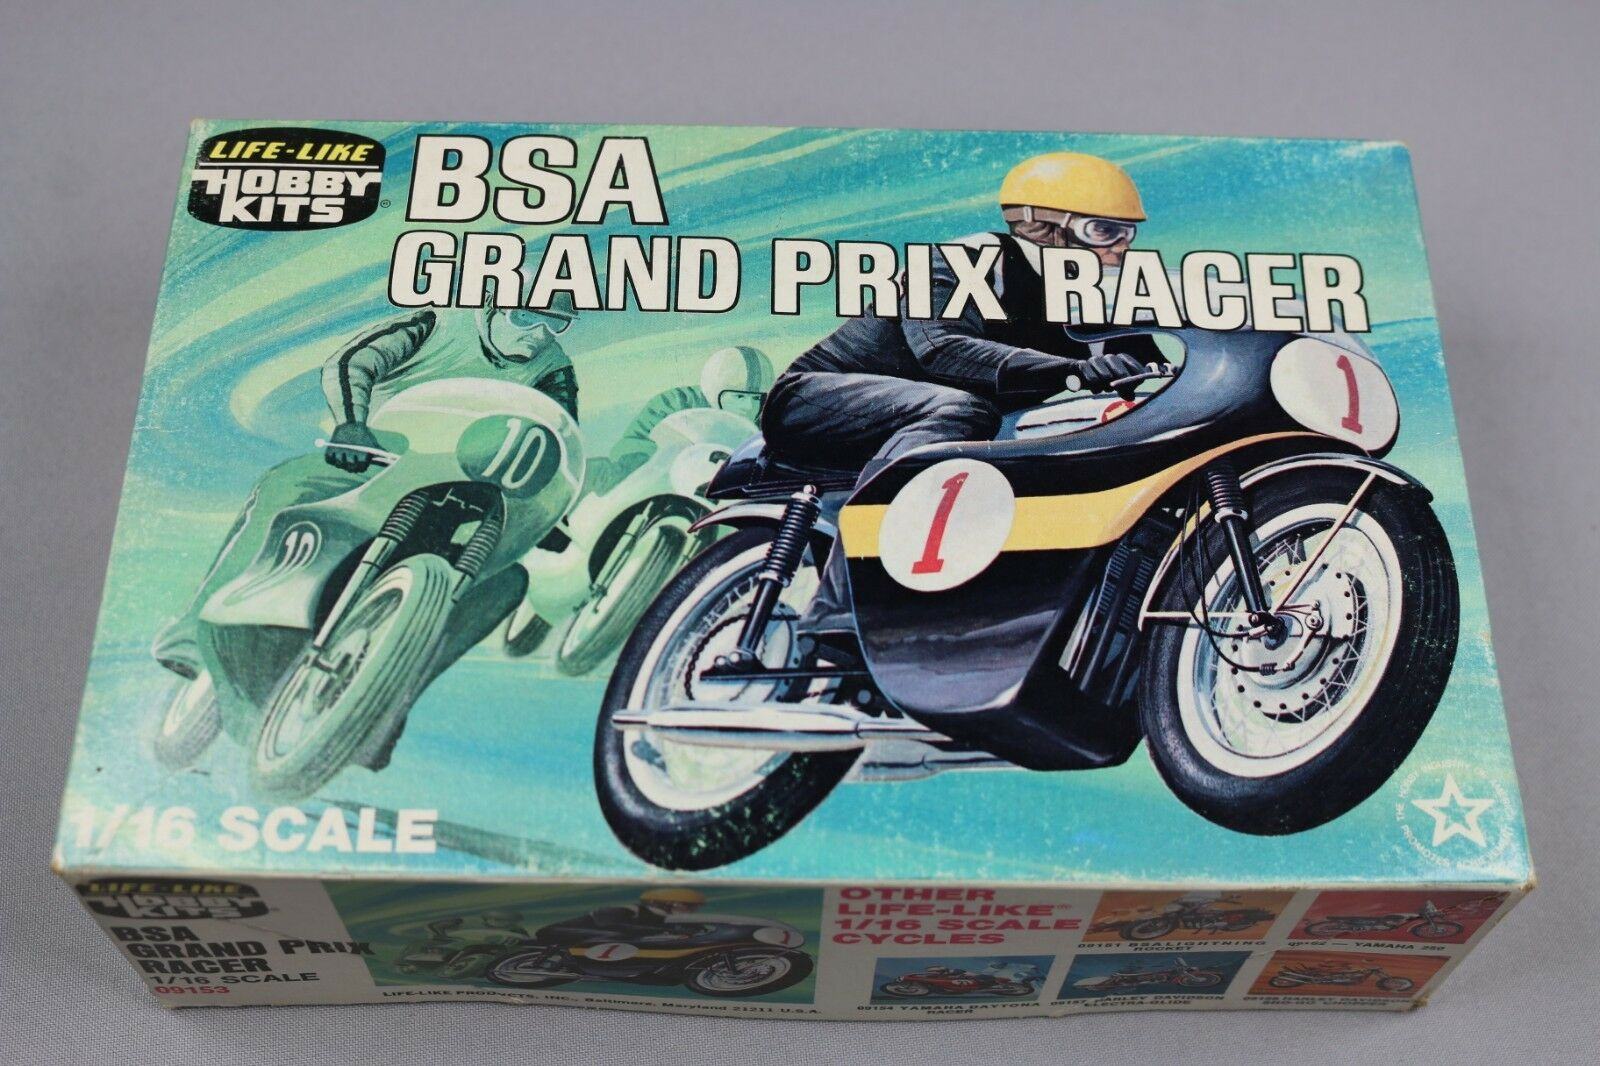 ZF1020 Life Like Hobby Kits 1 16 16 16 maquette moto 09153 BSA Grand Prix Racer 280611